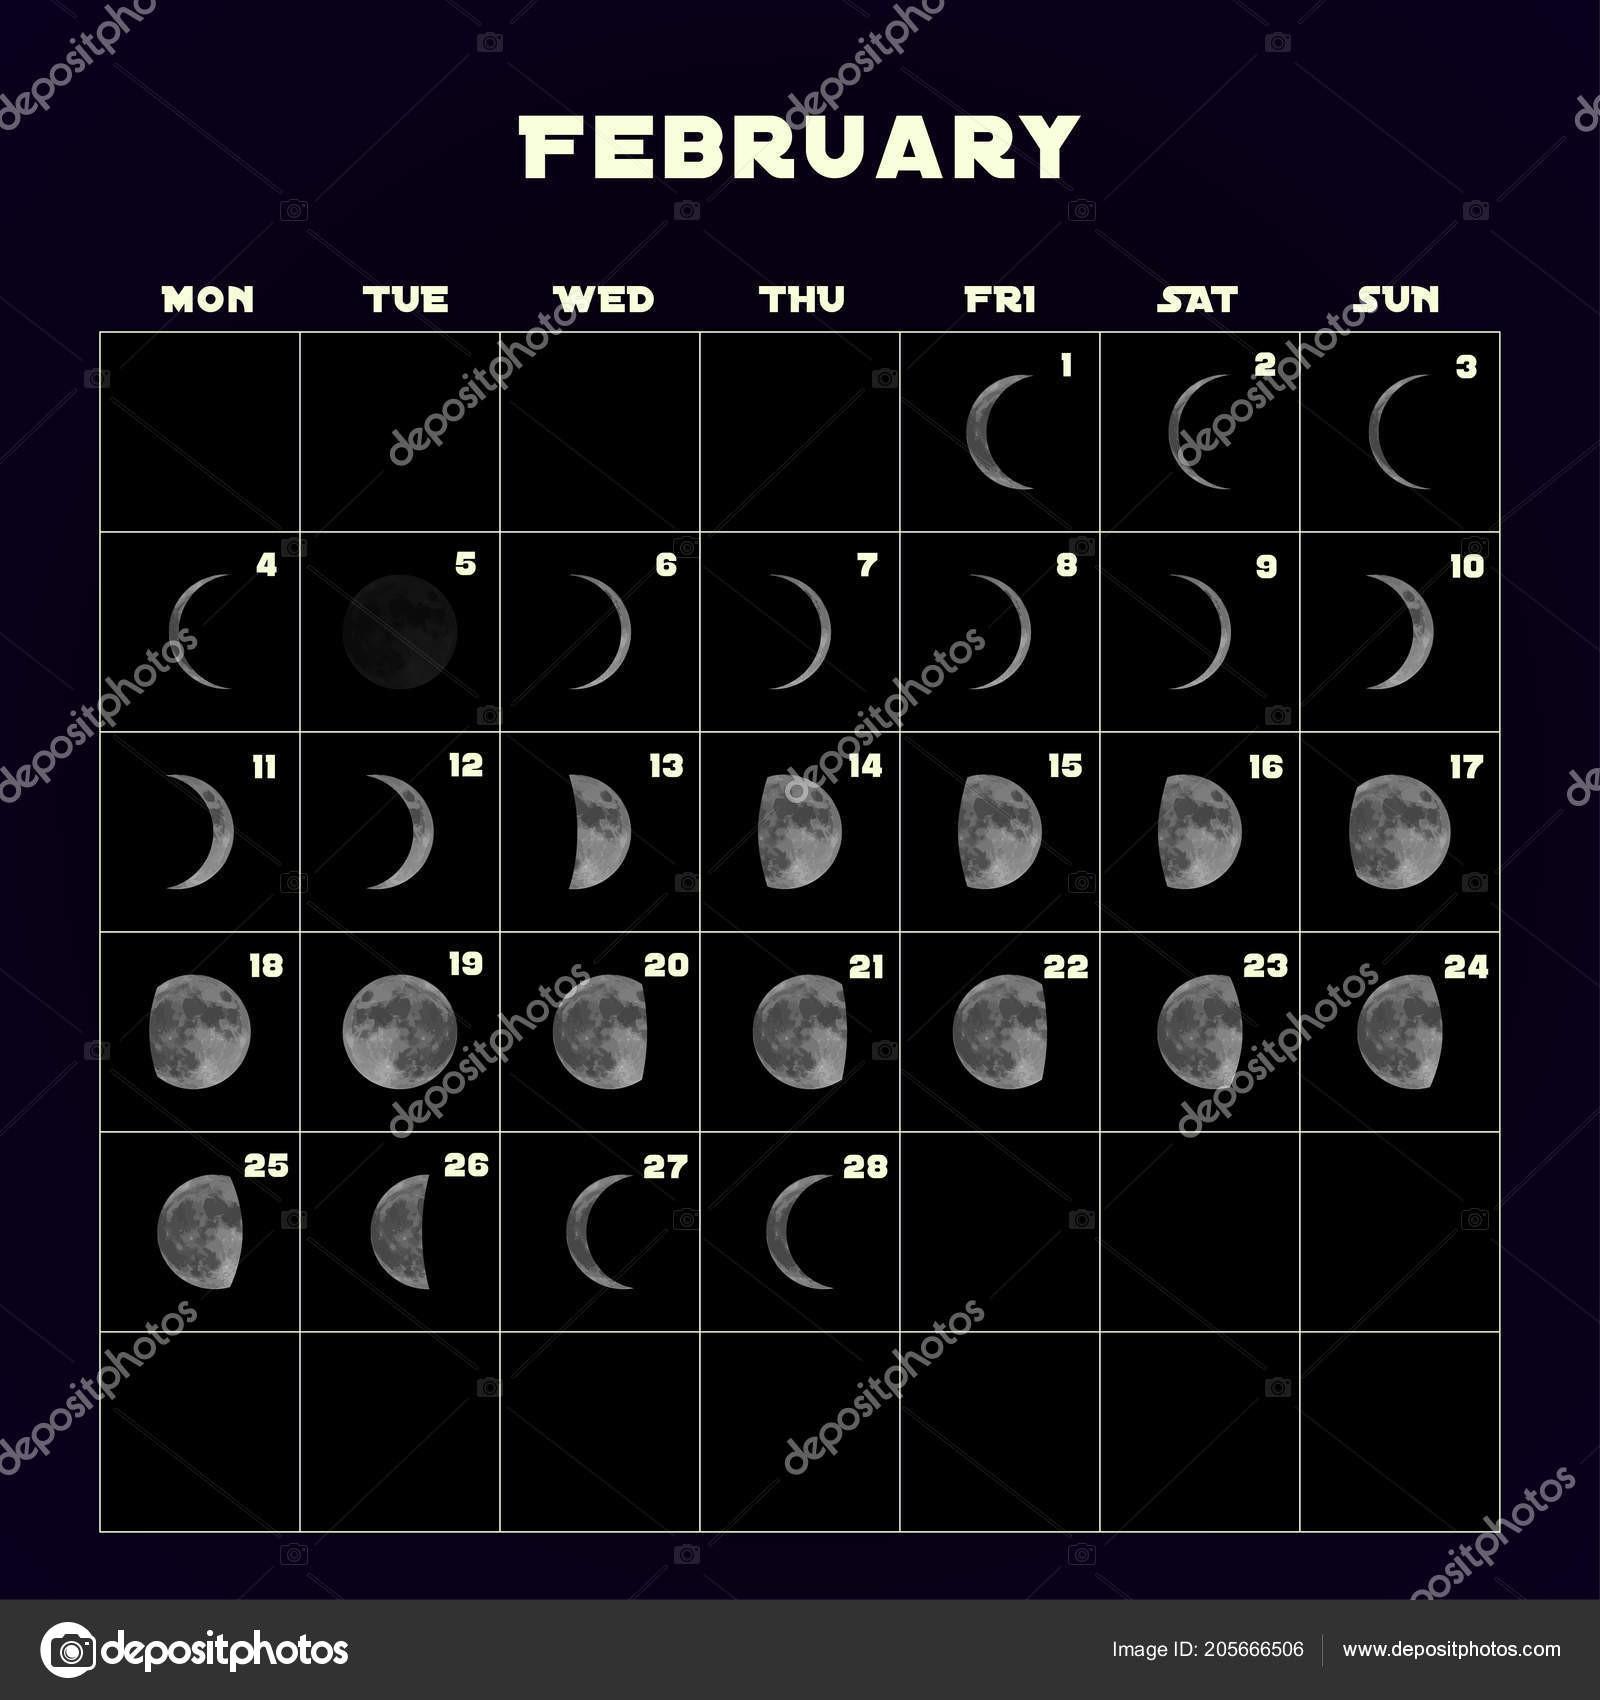 depositphotos stock illustration moon phases calendar for 2019